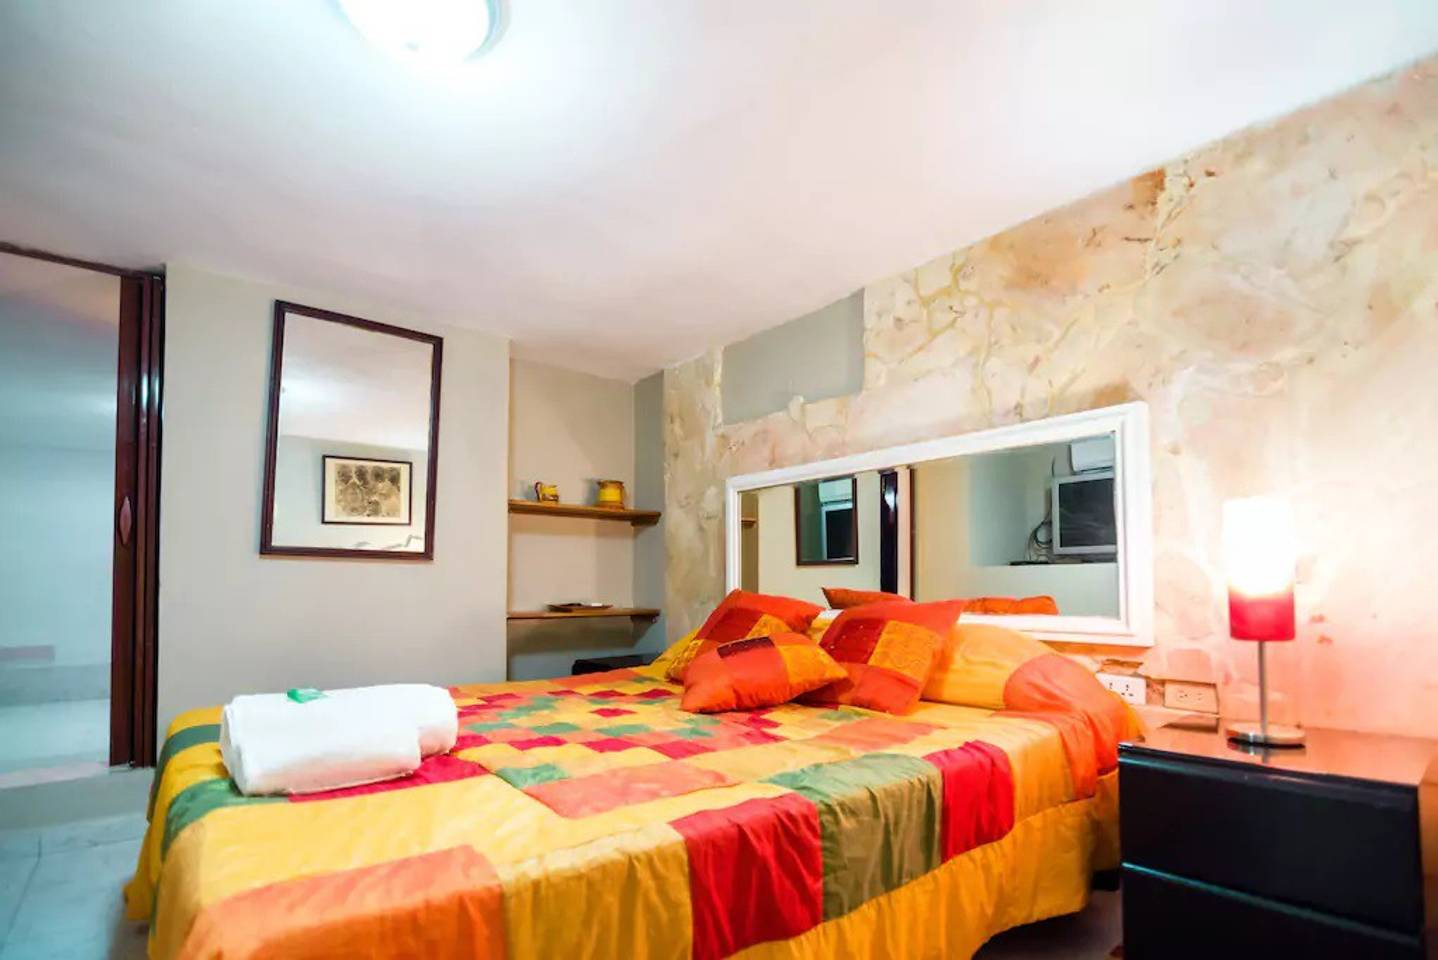 Apartment Villa Don Teto 8 Rooms  Luxury   Great Havana View photo 23332339